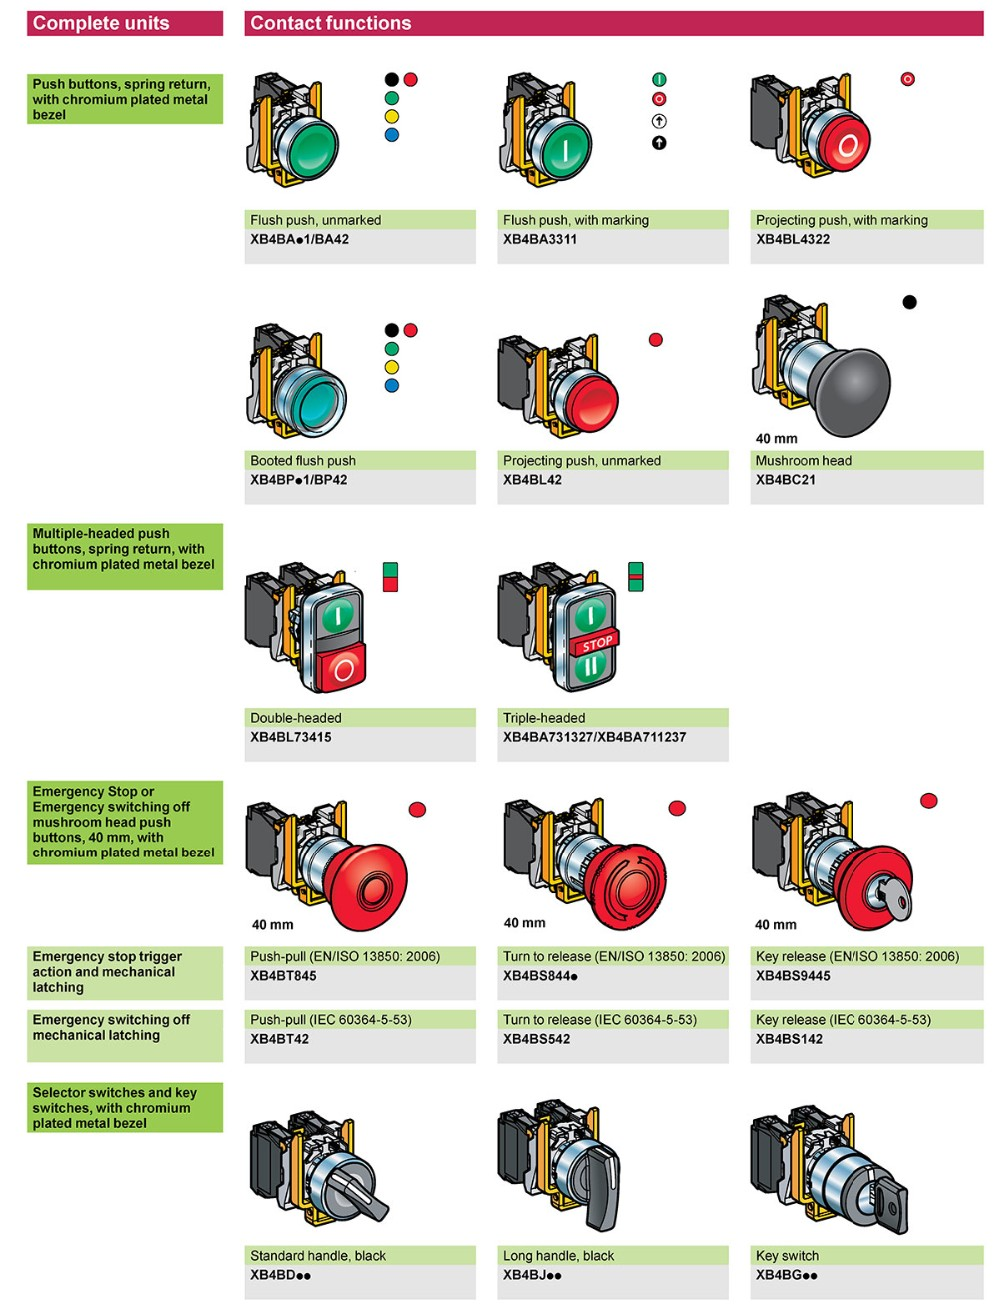 Emergency stop icon clipart emergency off - Xb2 Xb4 1no Bc21 Bc31 Bc51 Bc61 Bc42 Bc35 Bc45 22mm Momentary Emergency Stop 40mm Mushroom